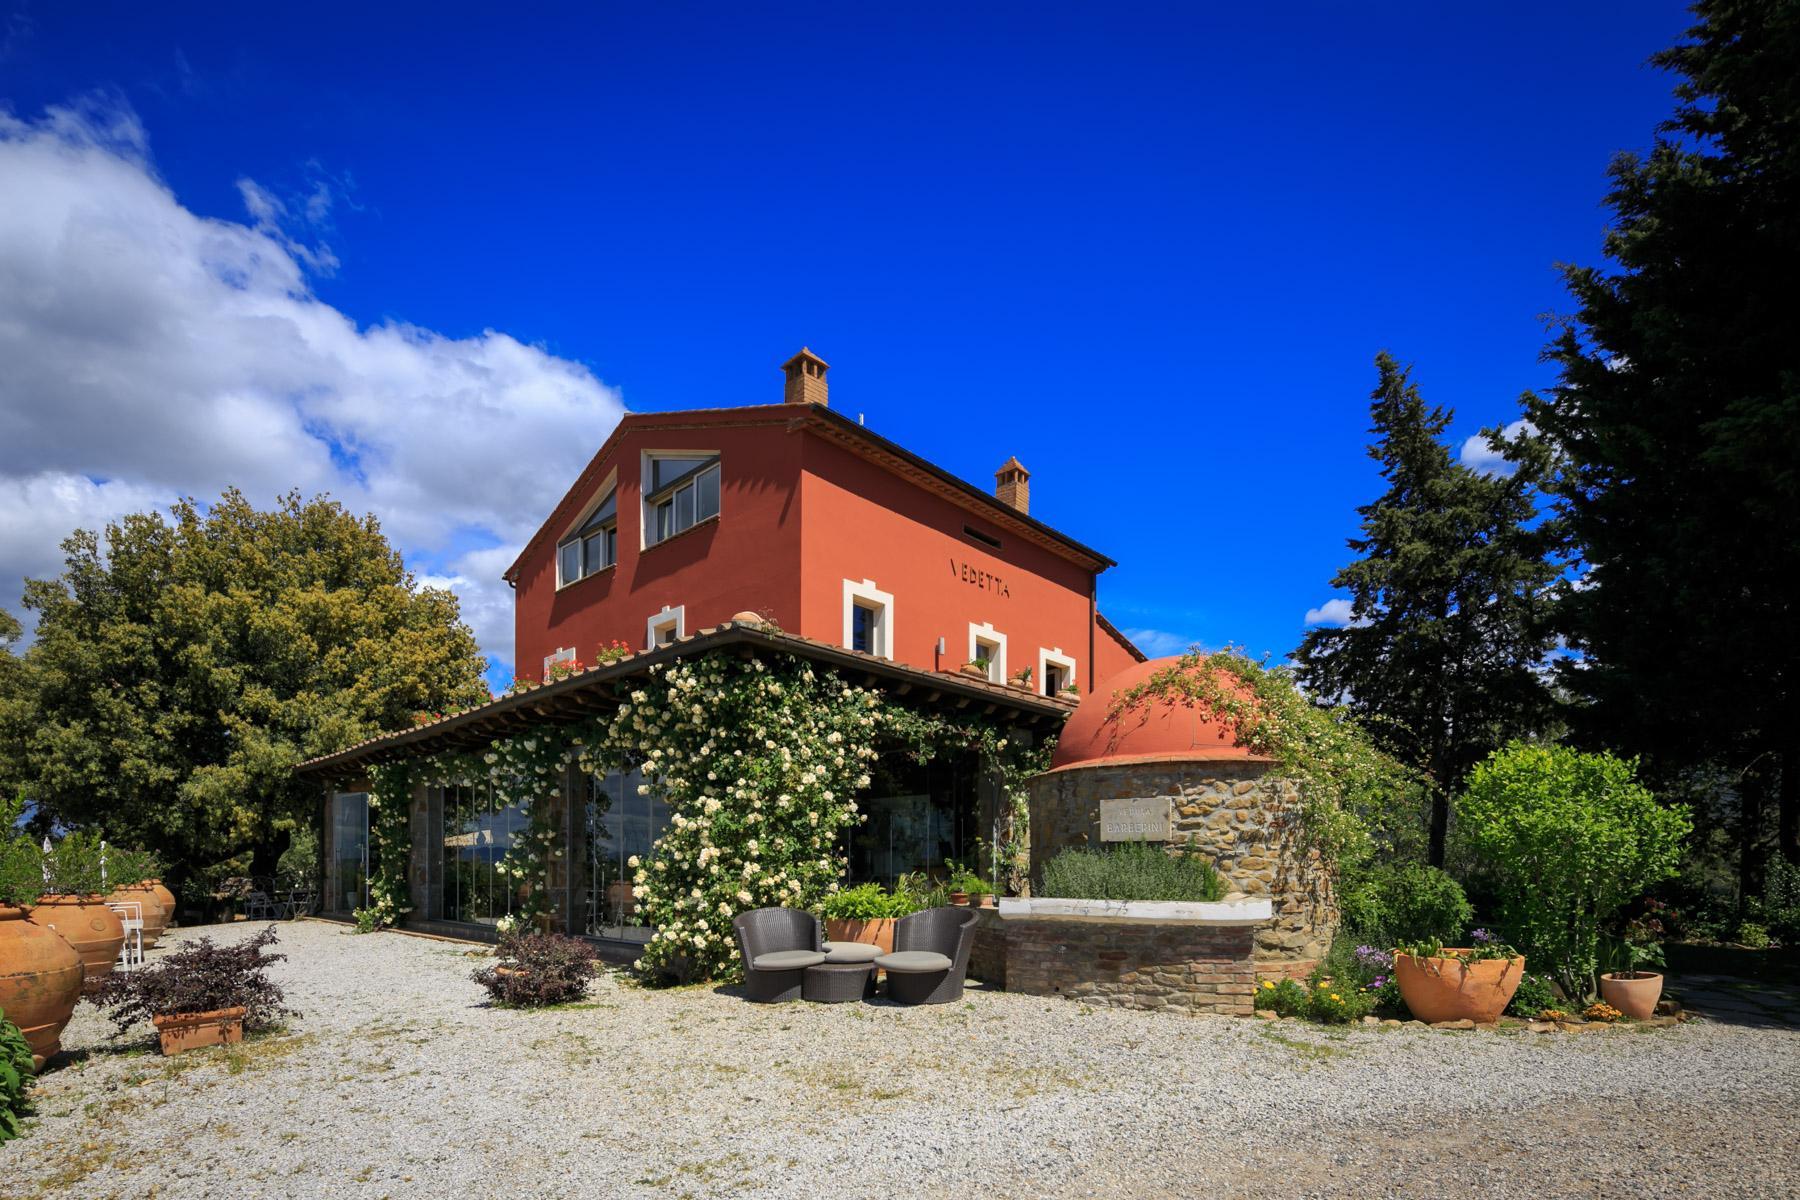 Villa historique avec vue imprenable sur le golfe de Scarlino - 4